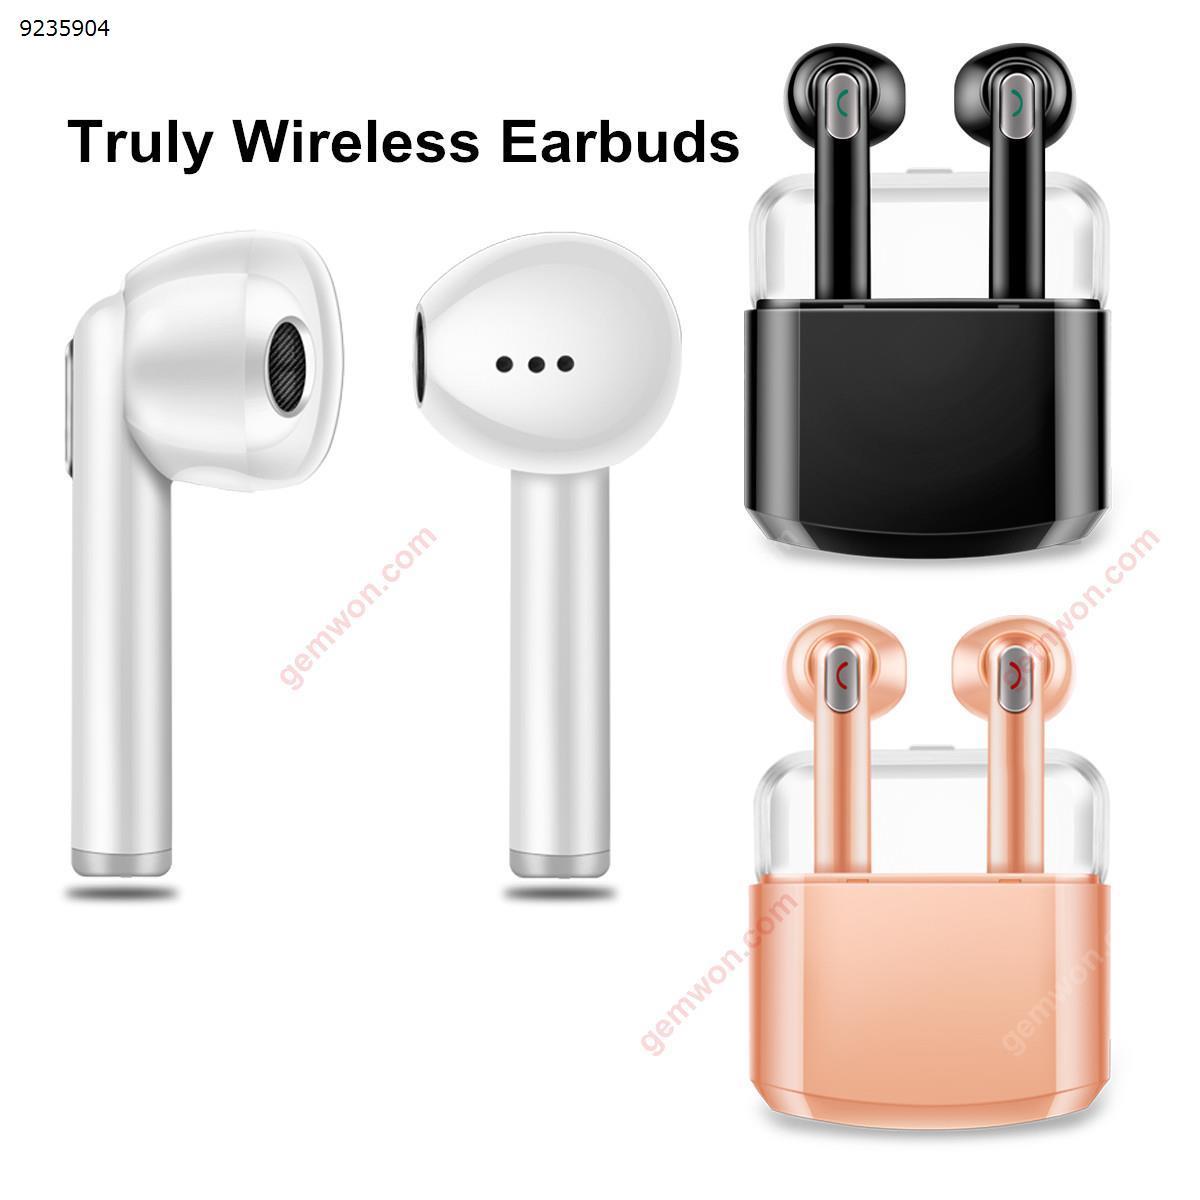 TWS Mini Portable Dual Wireless Bluetoothe Earphones Headphones with Charging Box(white) Headset N/A